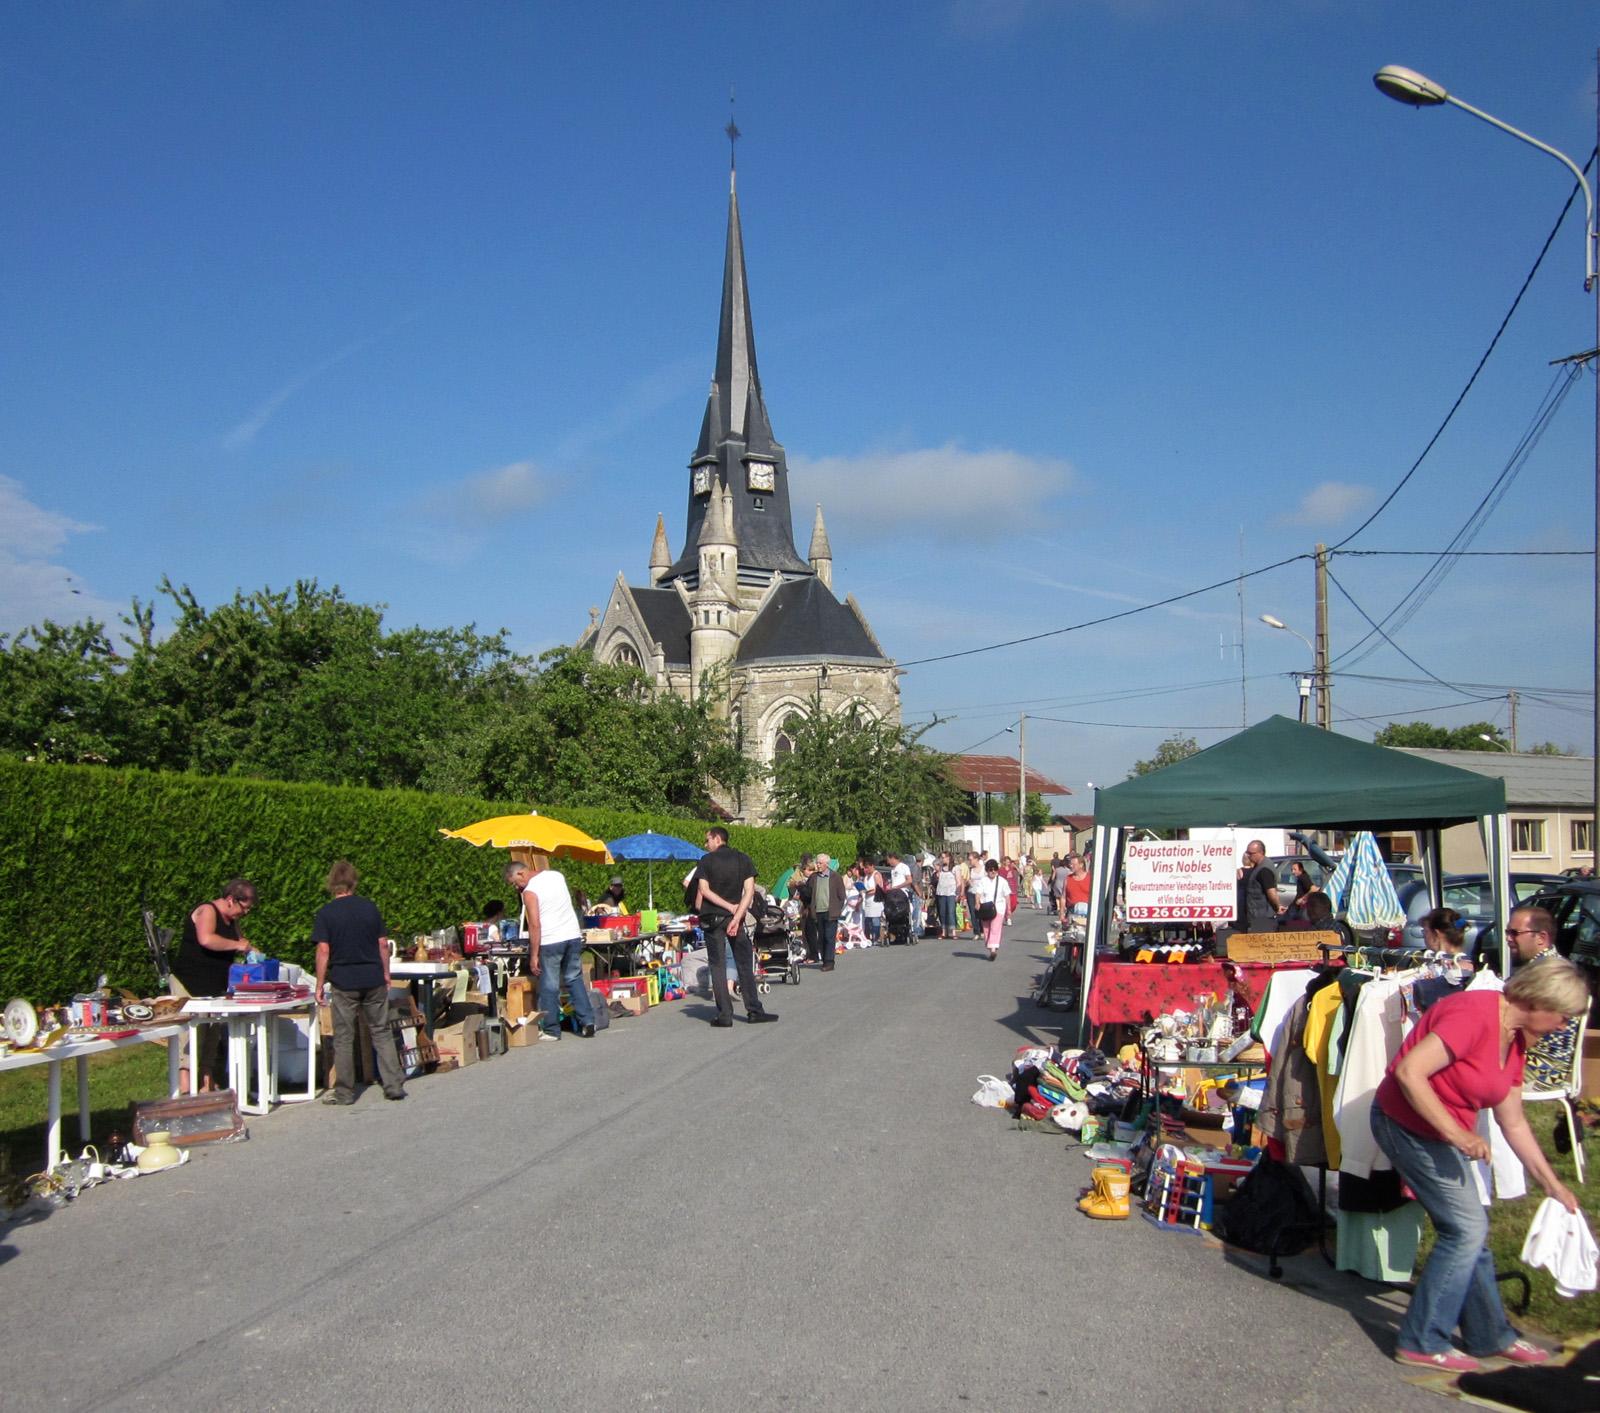 Cernay-en-Dormois